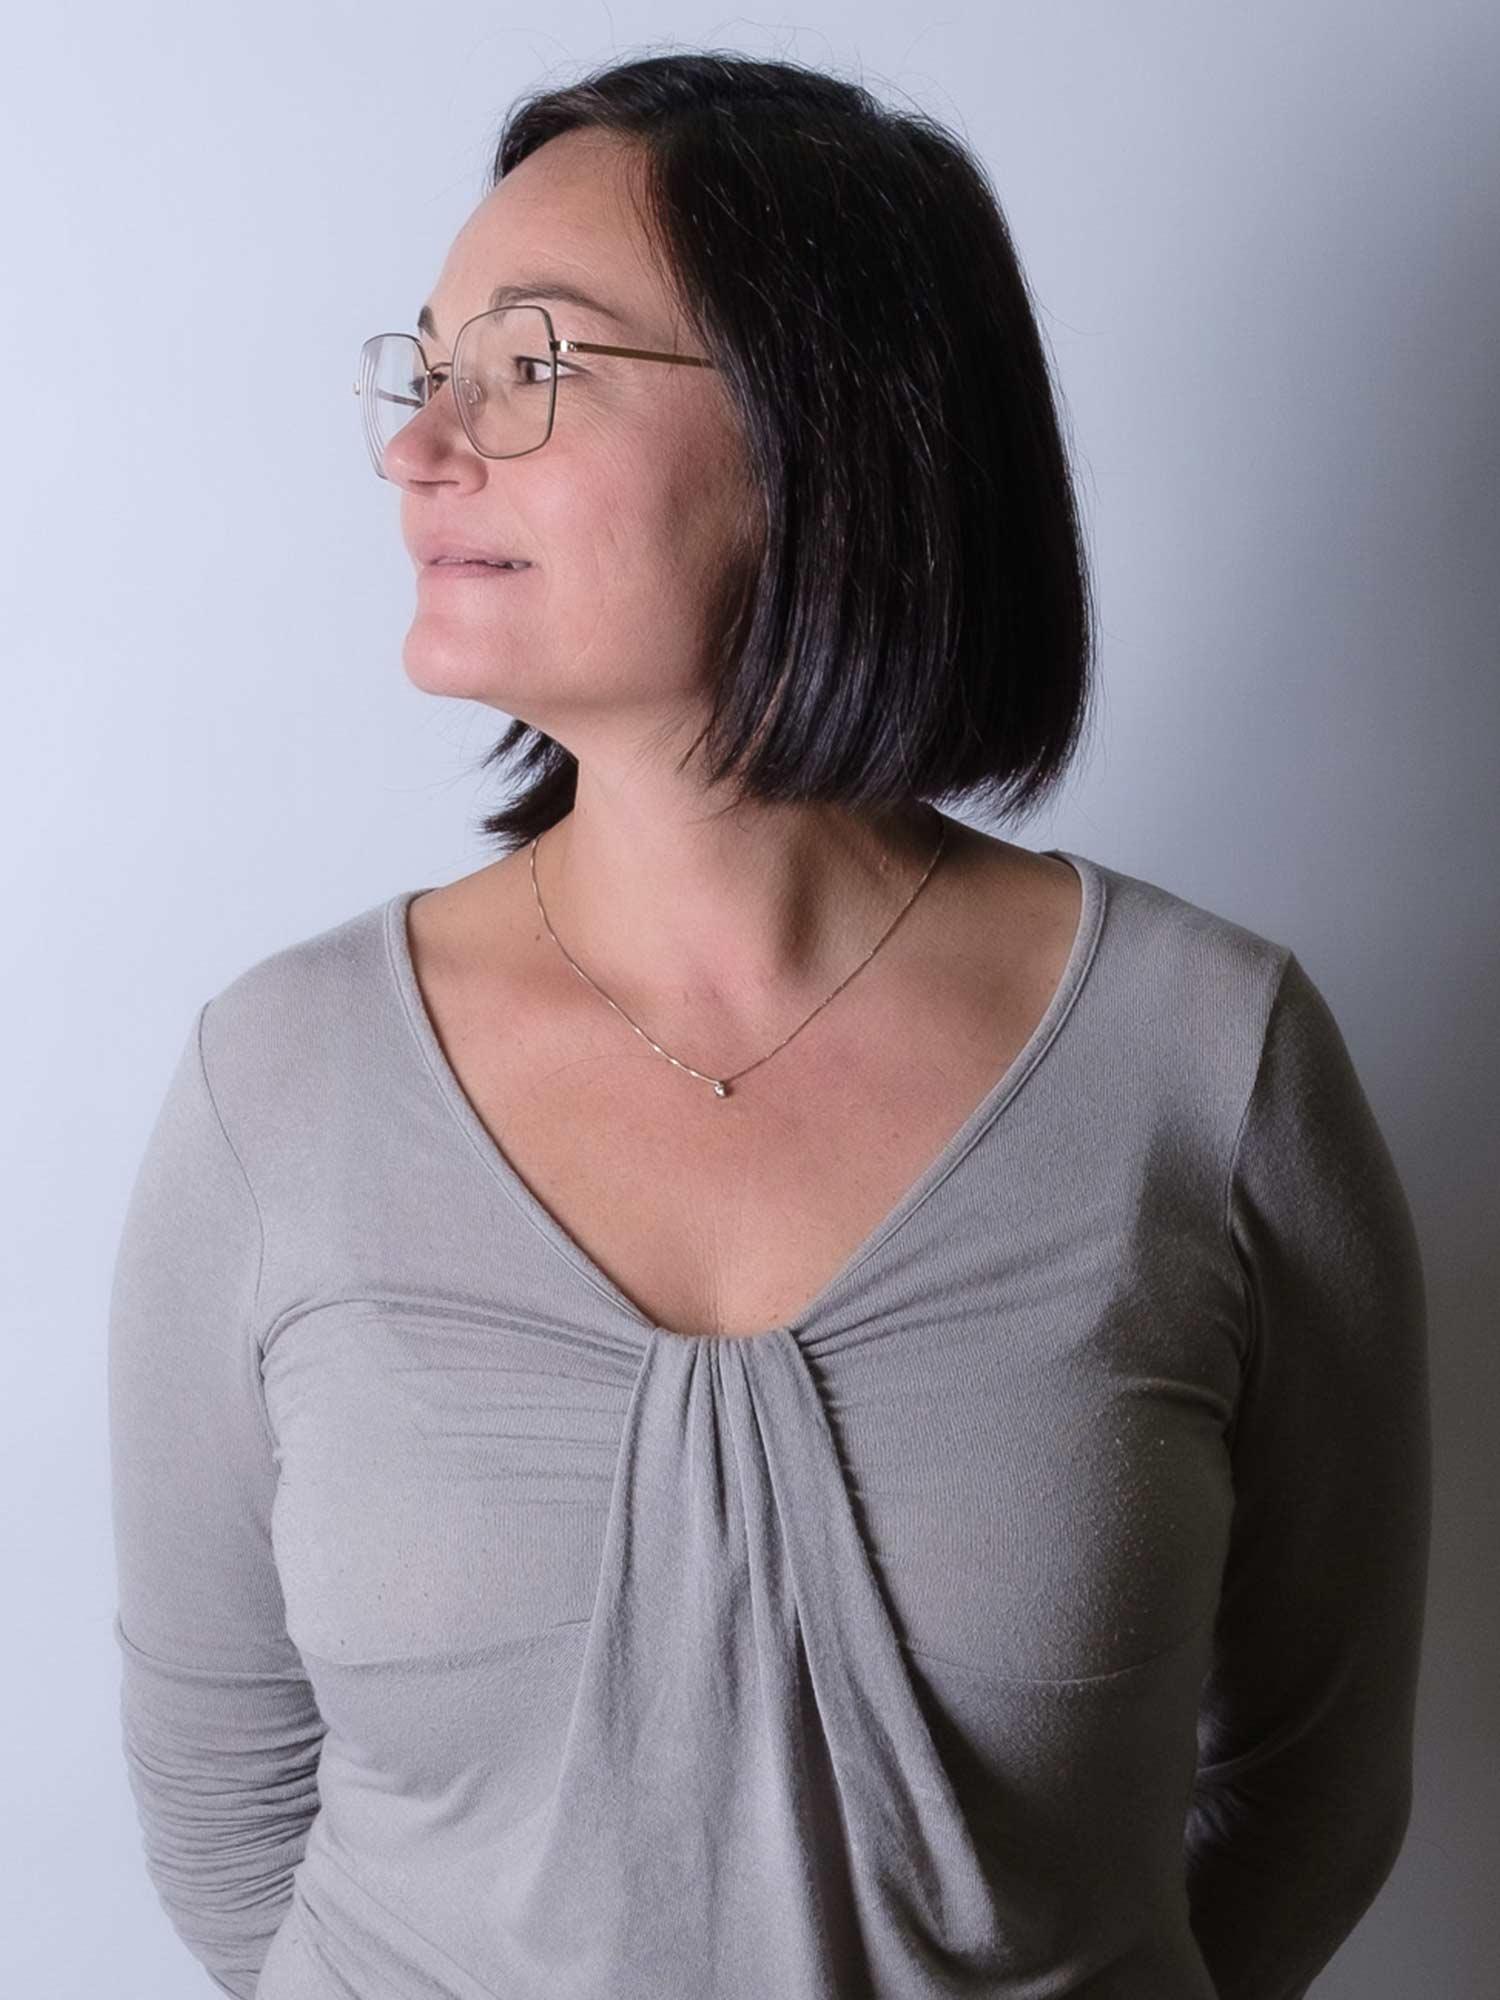 Nicoletta Saccone